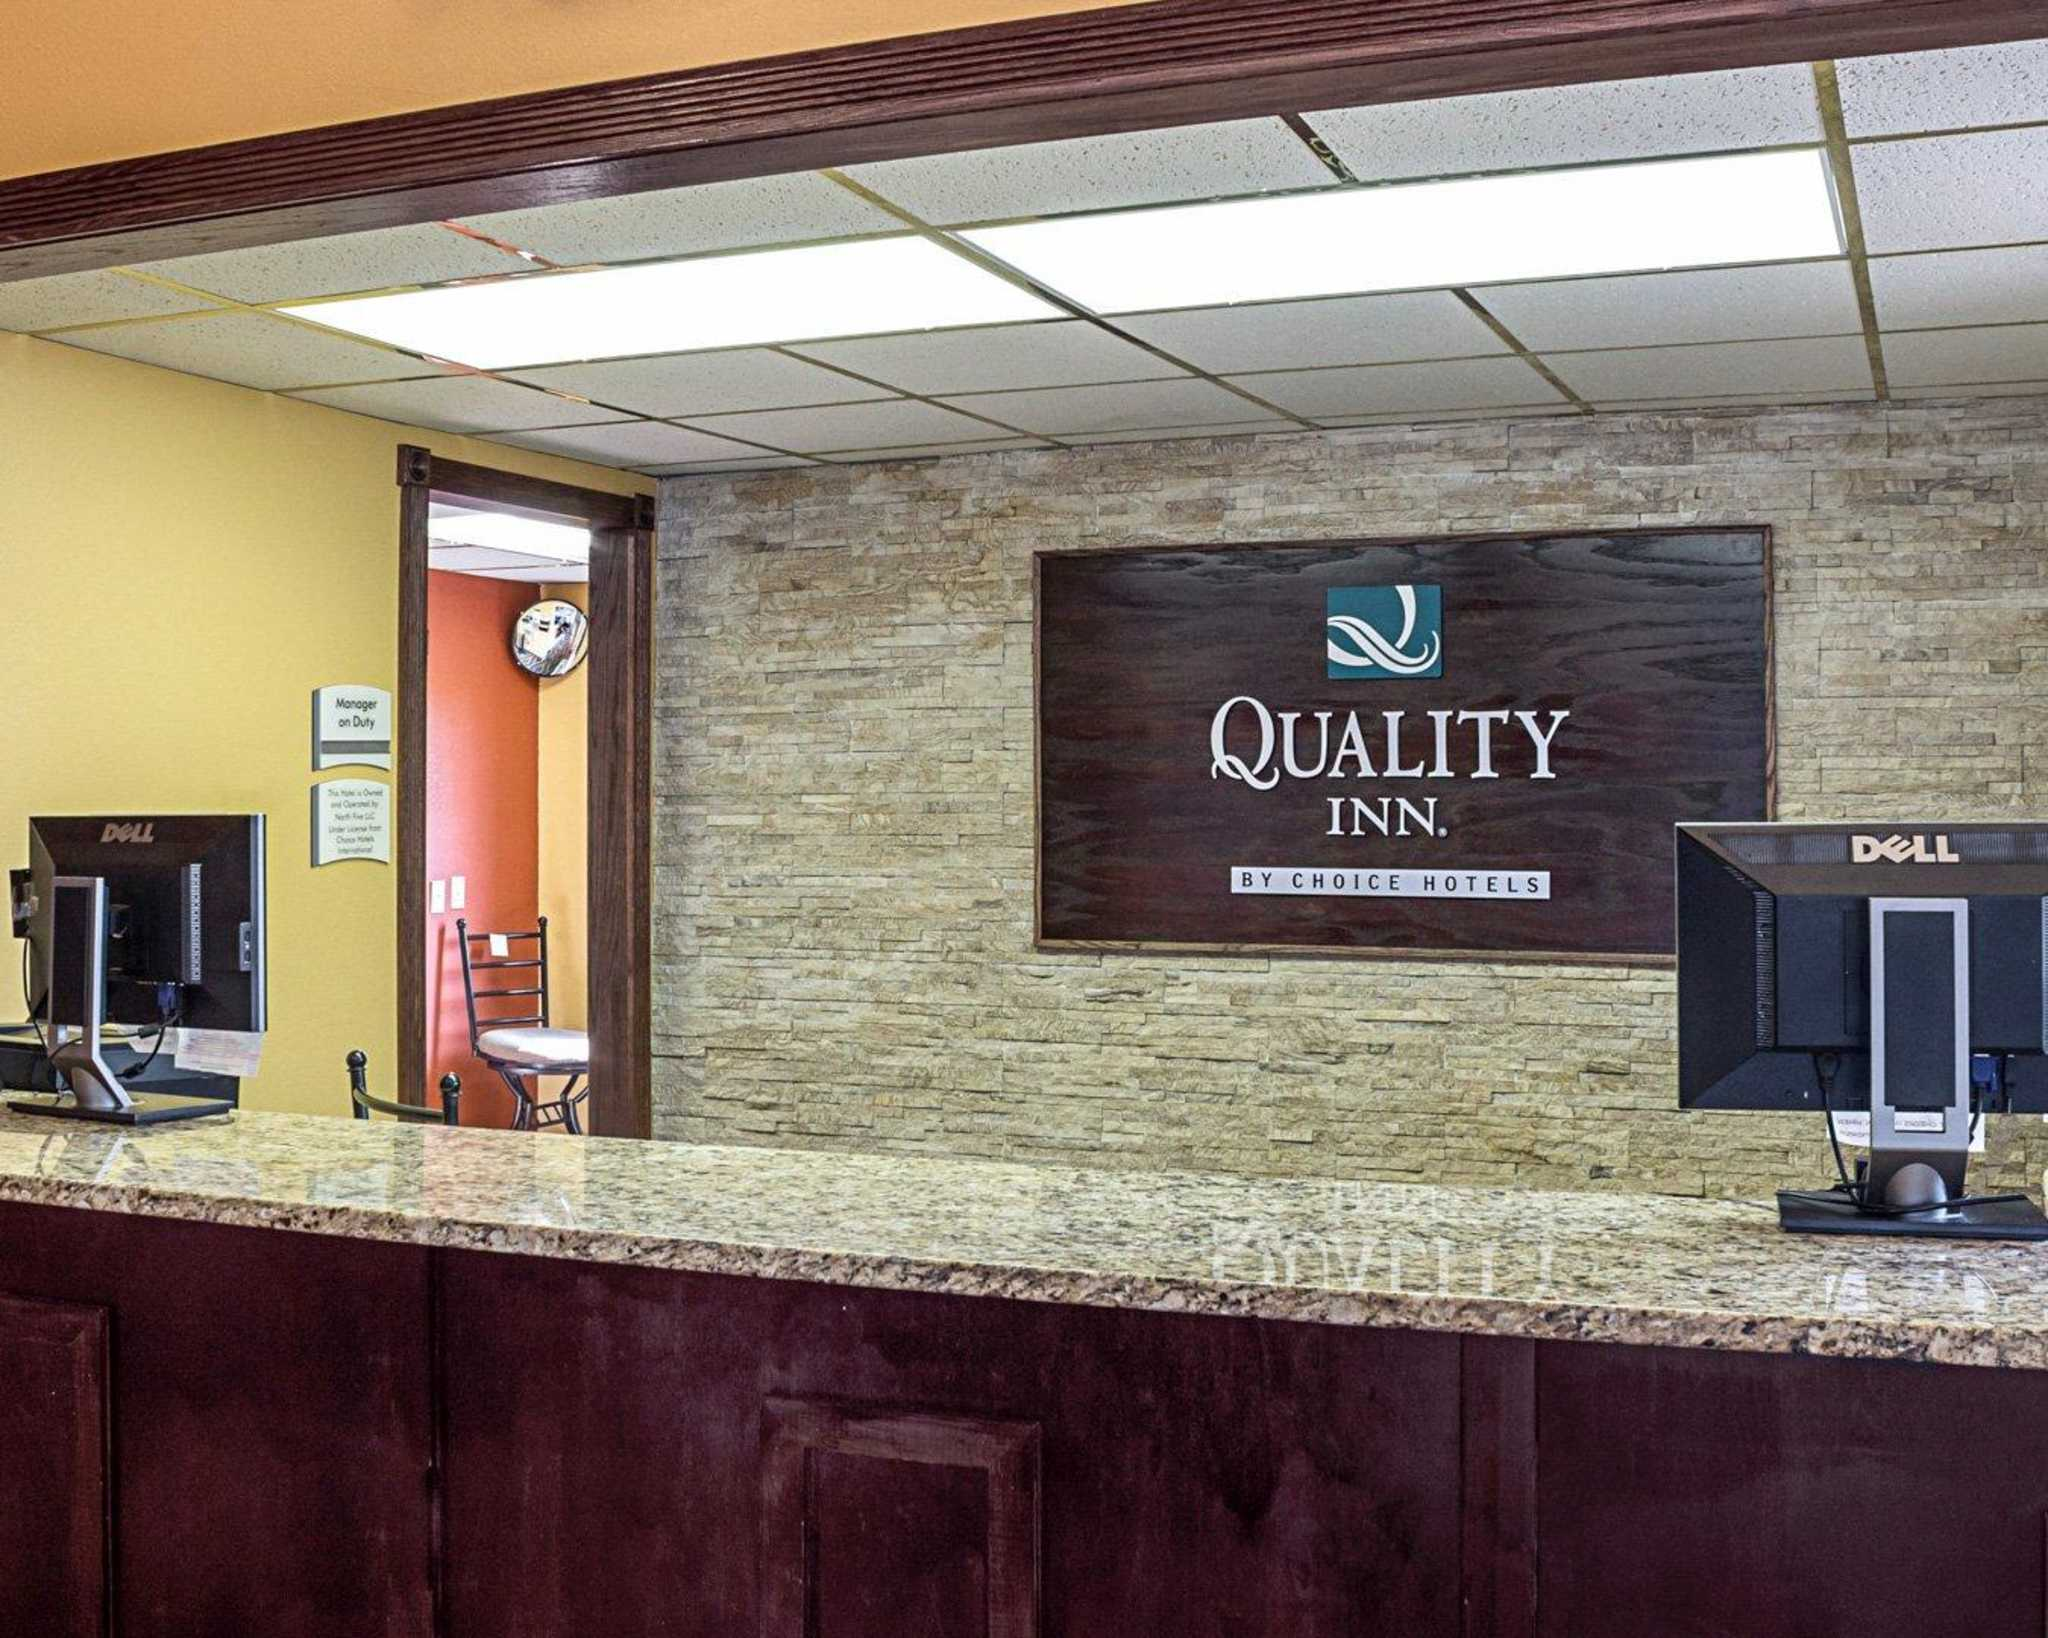 Quality Inn image 4